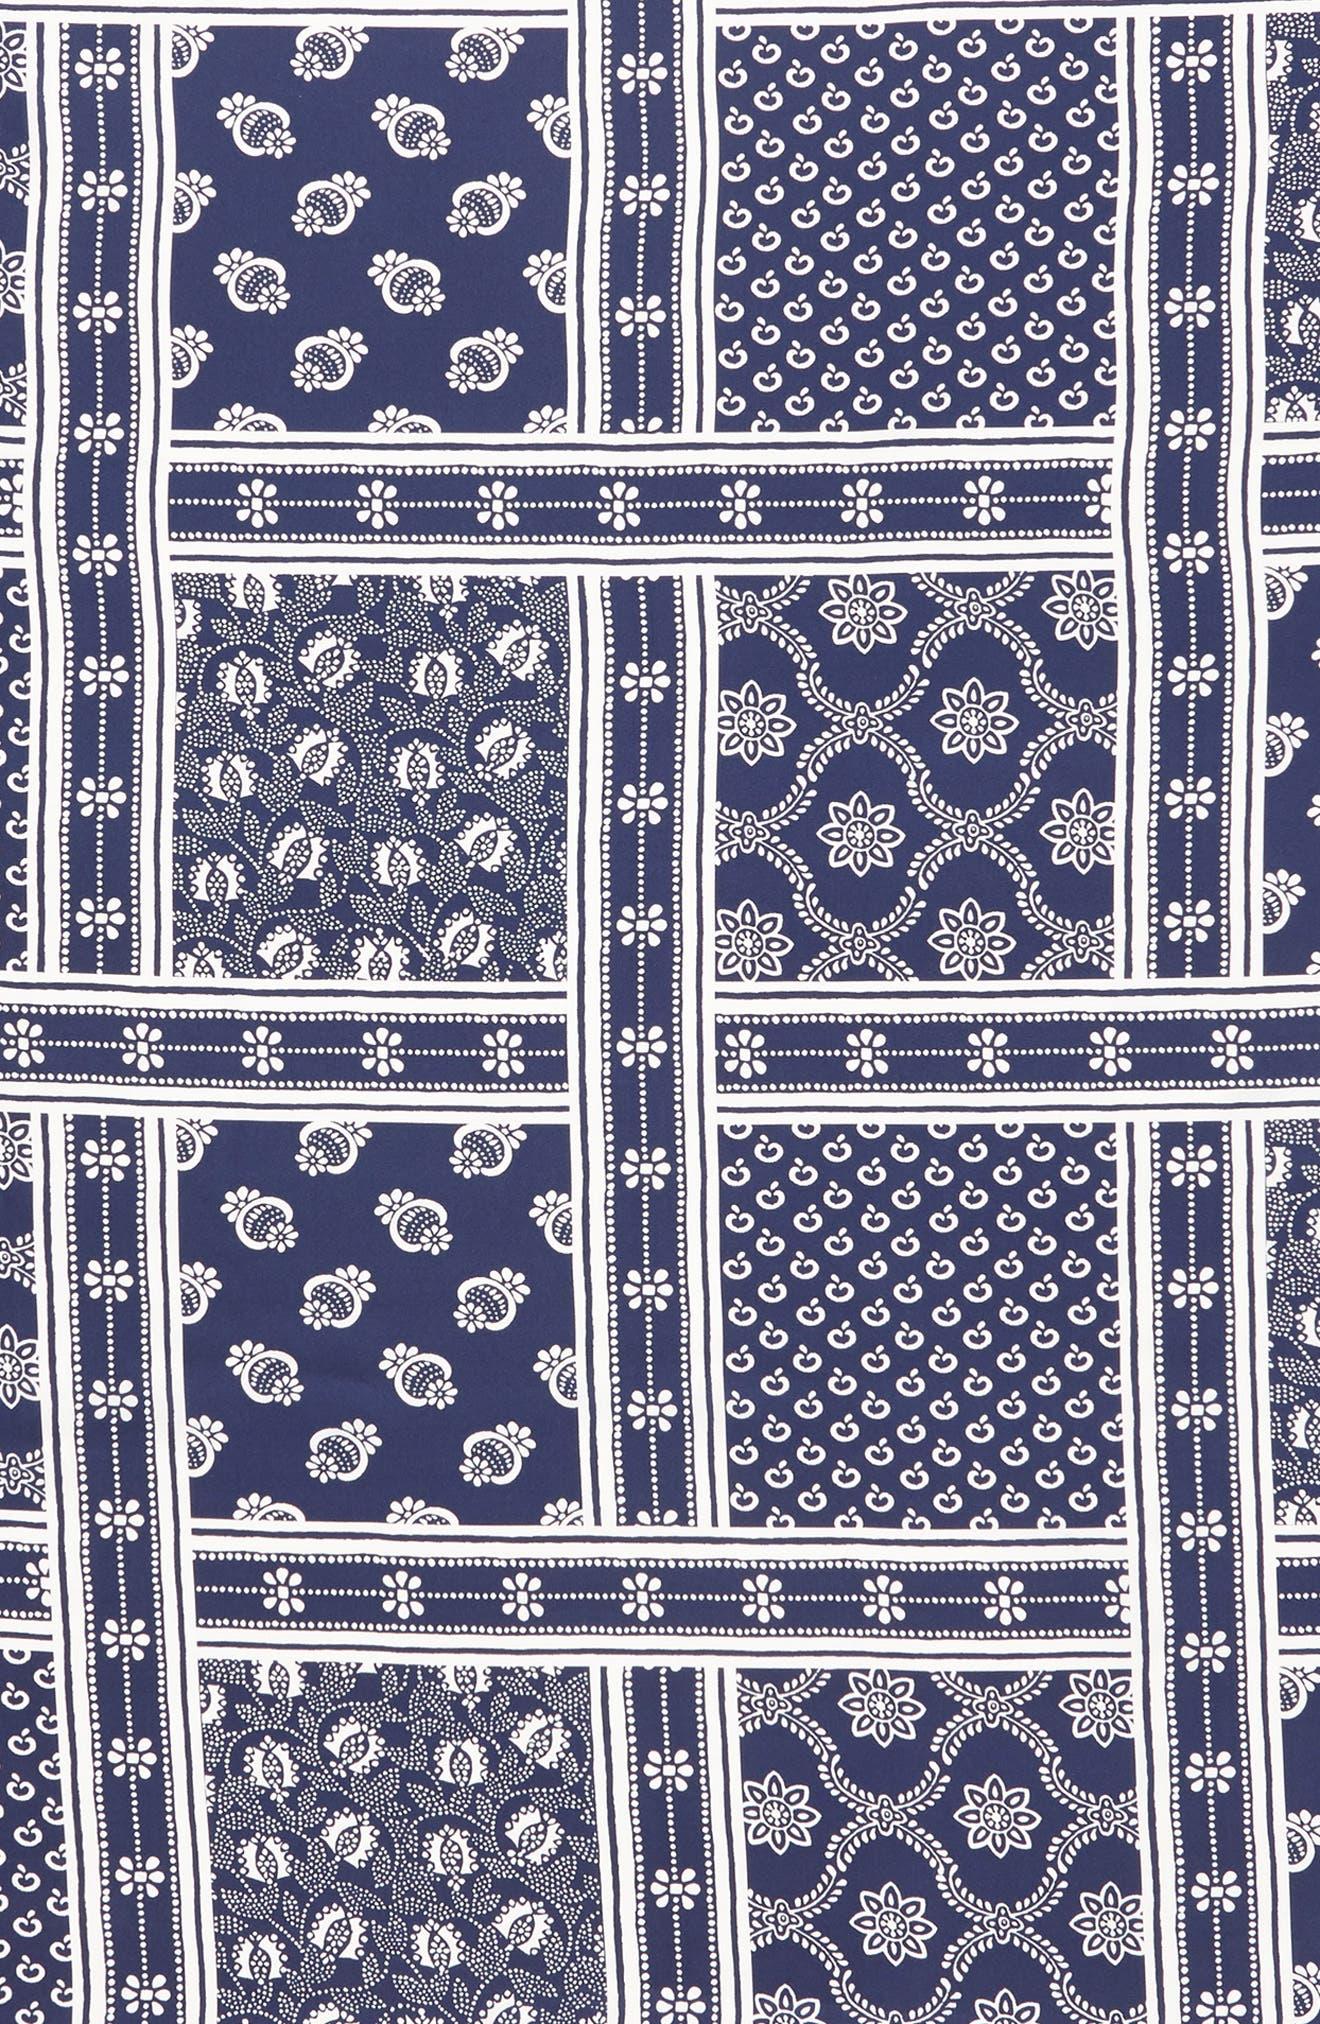 Bandana Print Silk Scarf,                             Alternate thumbnail 4, color,                             White